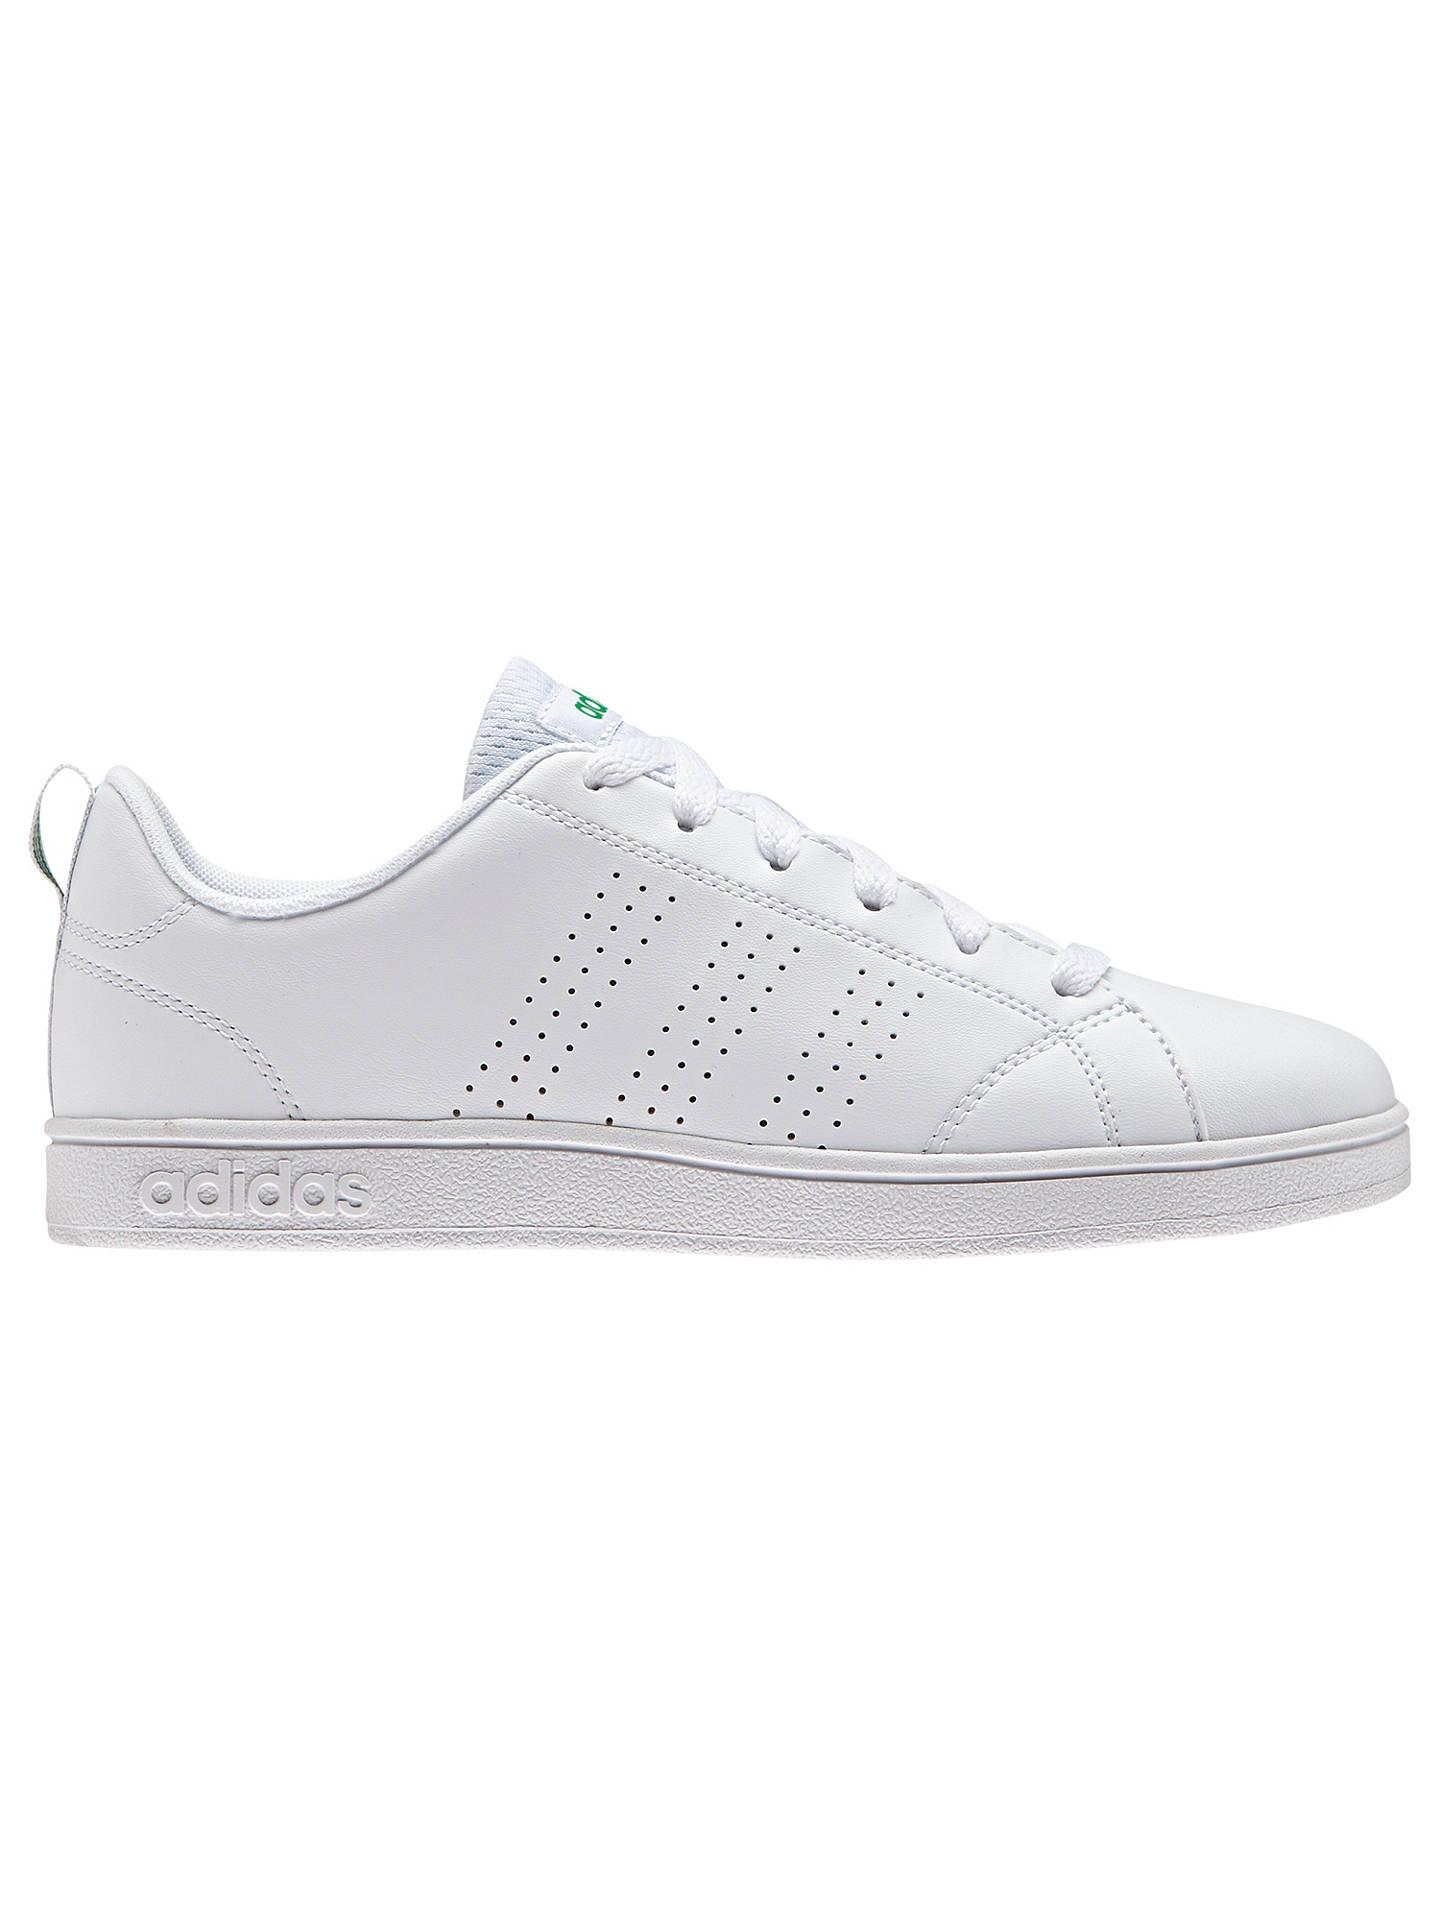 a6b022196dad Buy adidas Children s Advantage VS Lace Up Sports Shoes